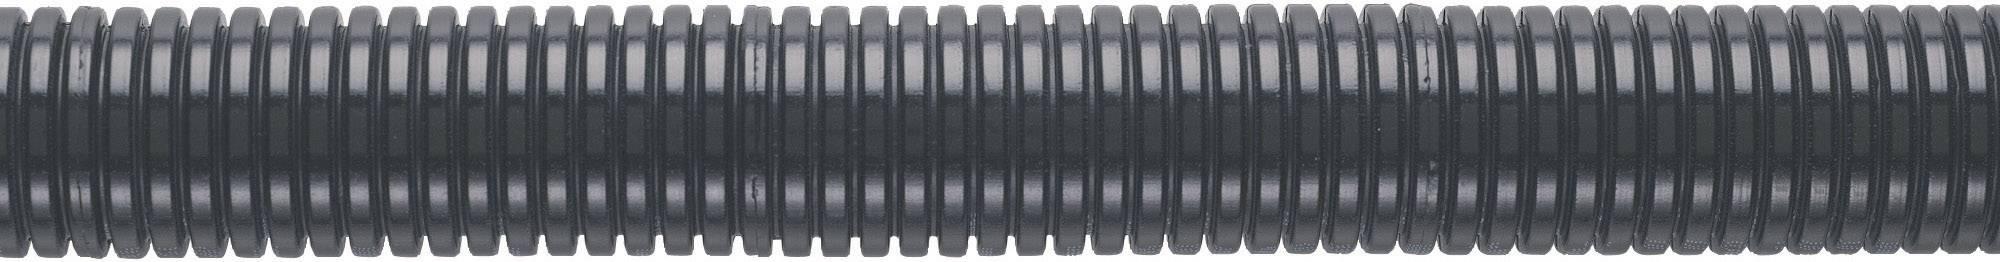 Ochranný plášť (10 m) LappKabel SILVYN FPAS 18/14,2x18,5 BK (61754275), PA 6